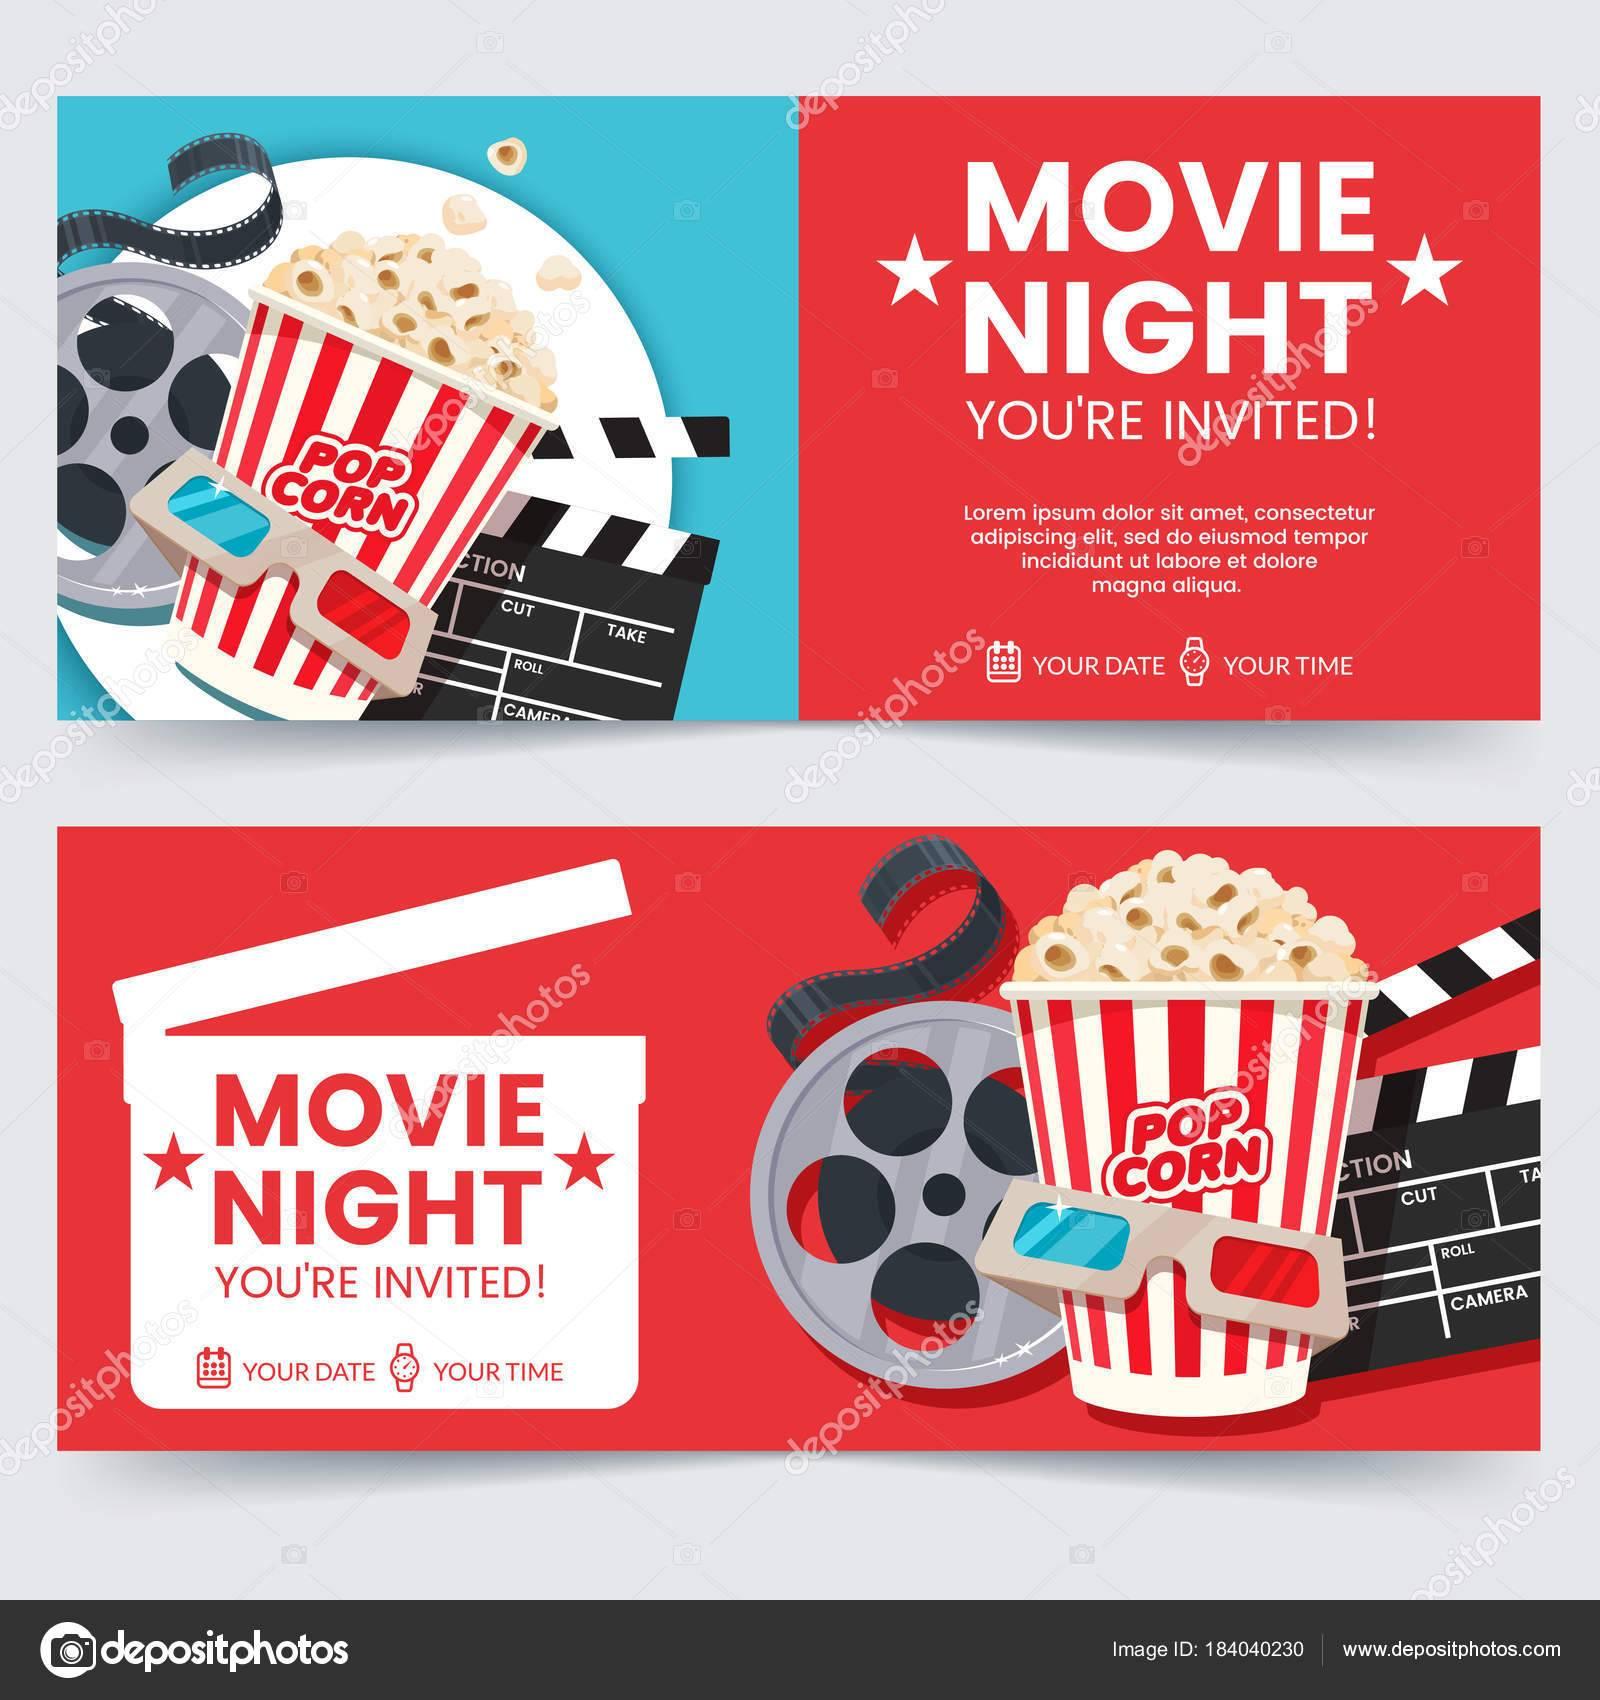 Movie Poster Invitation Template